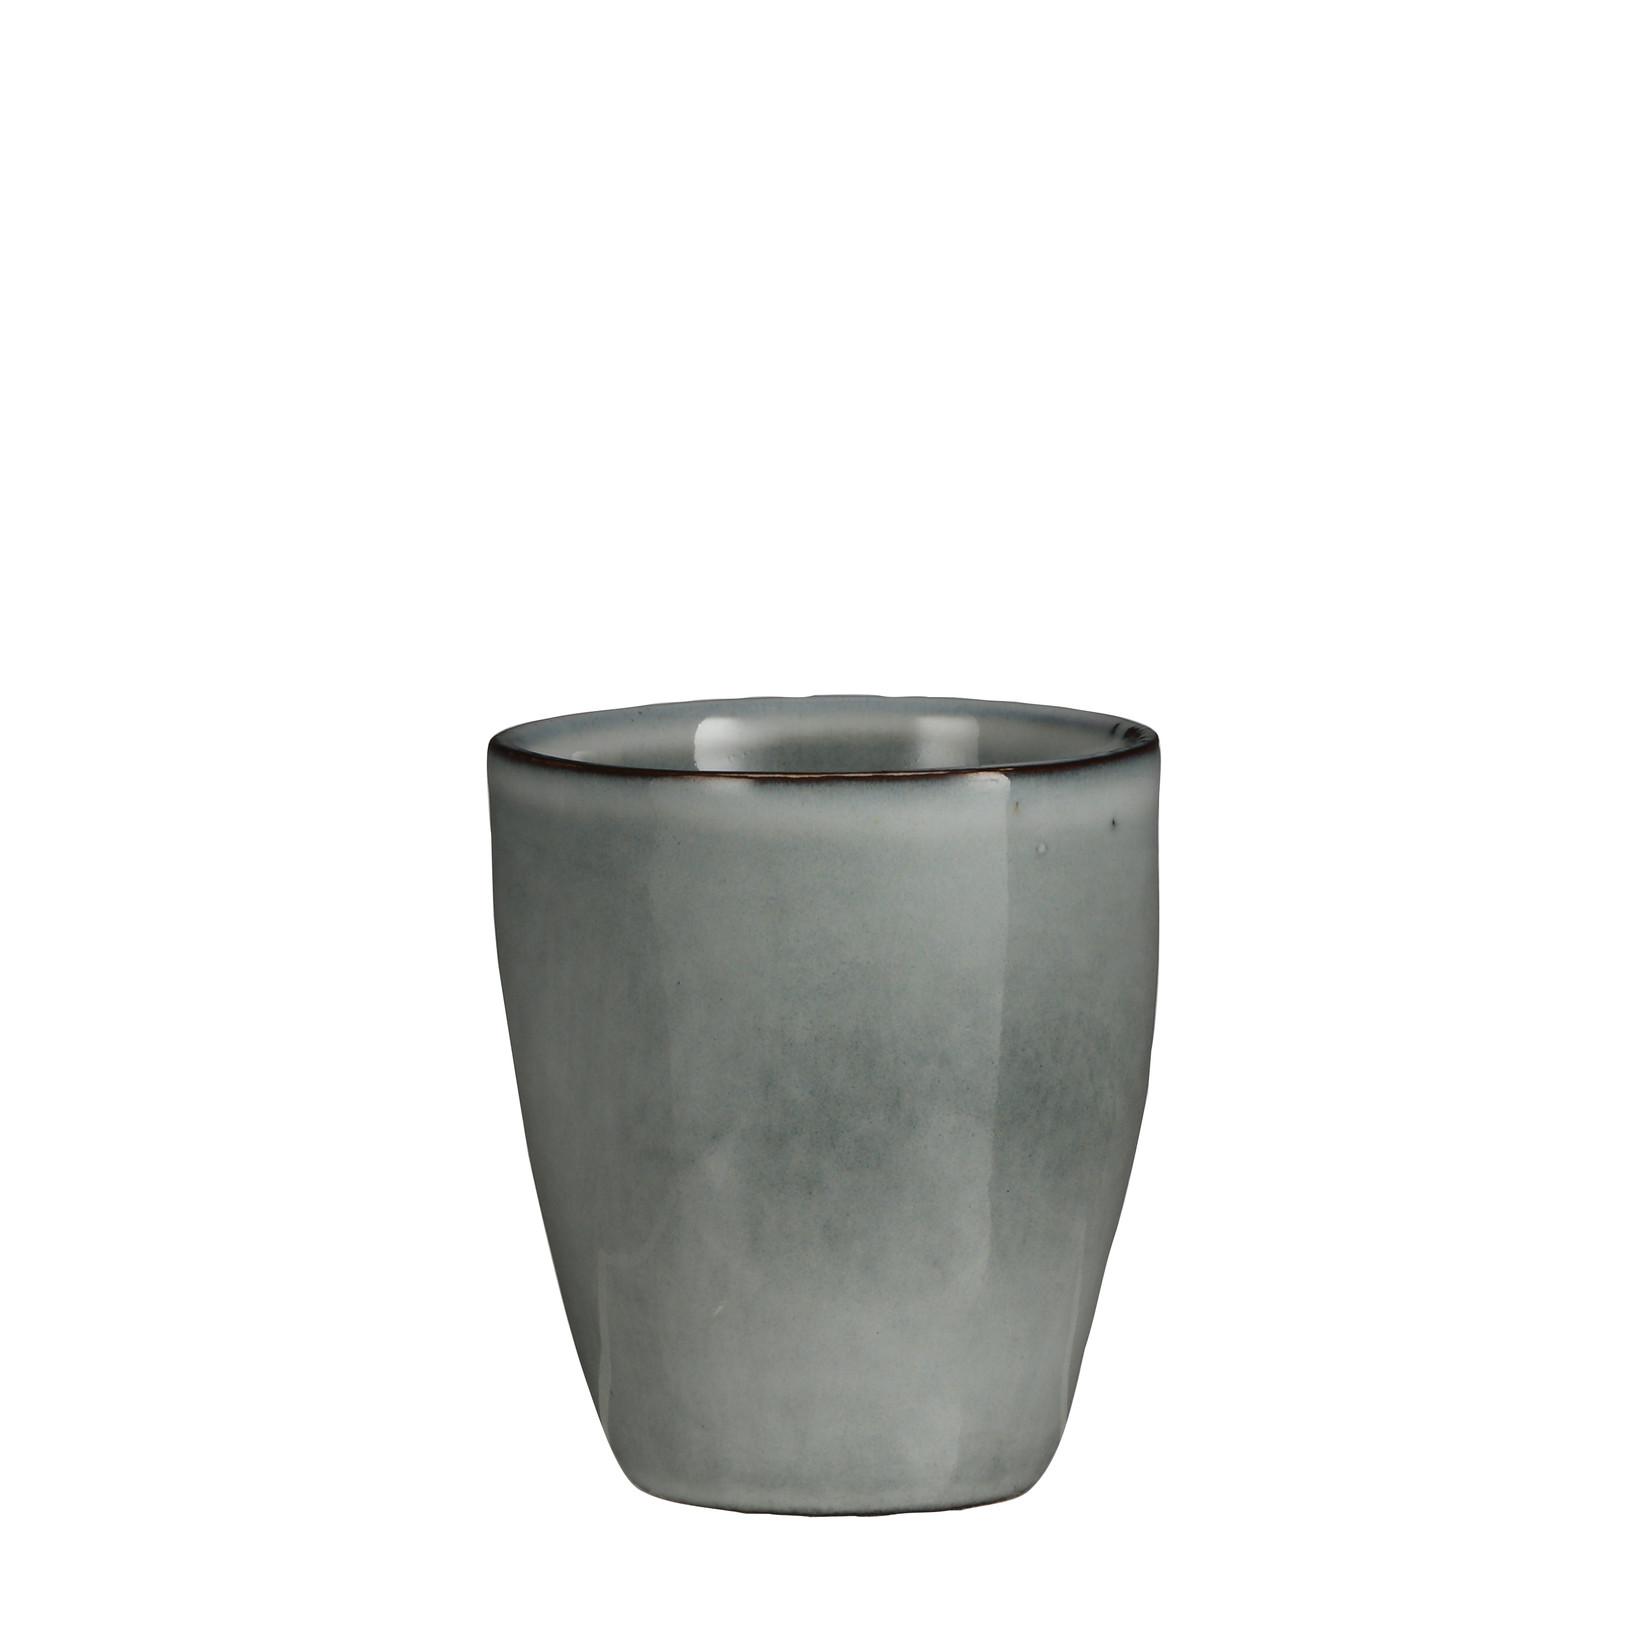 MiCa 1065502 Tabo senseo beker grijs